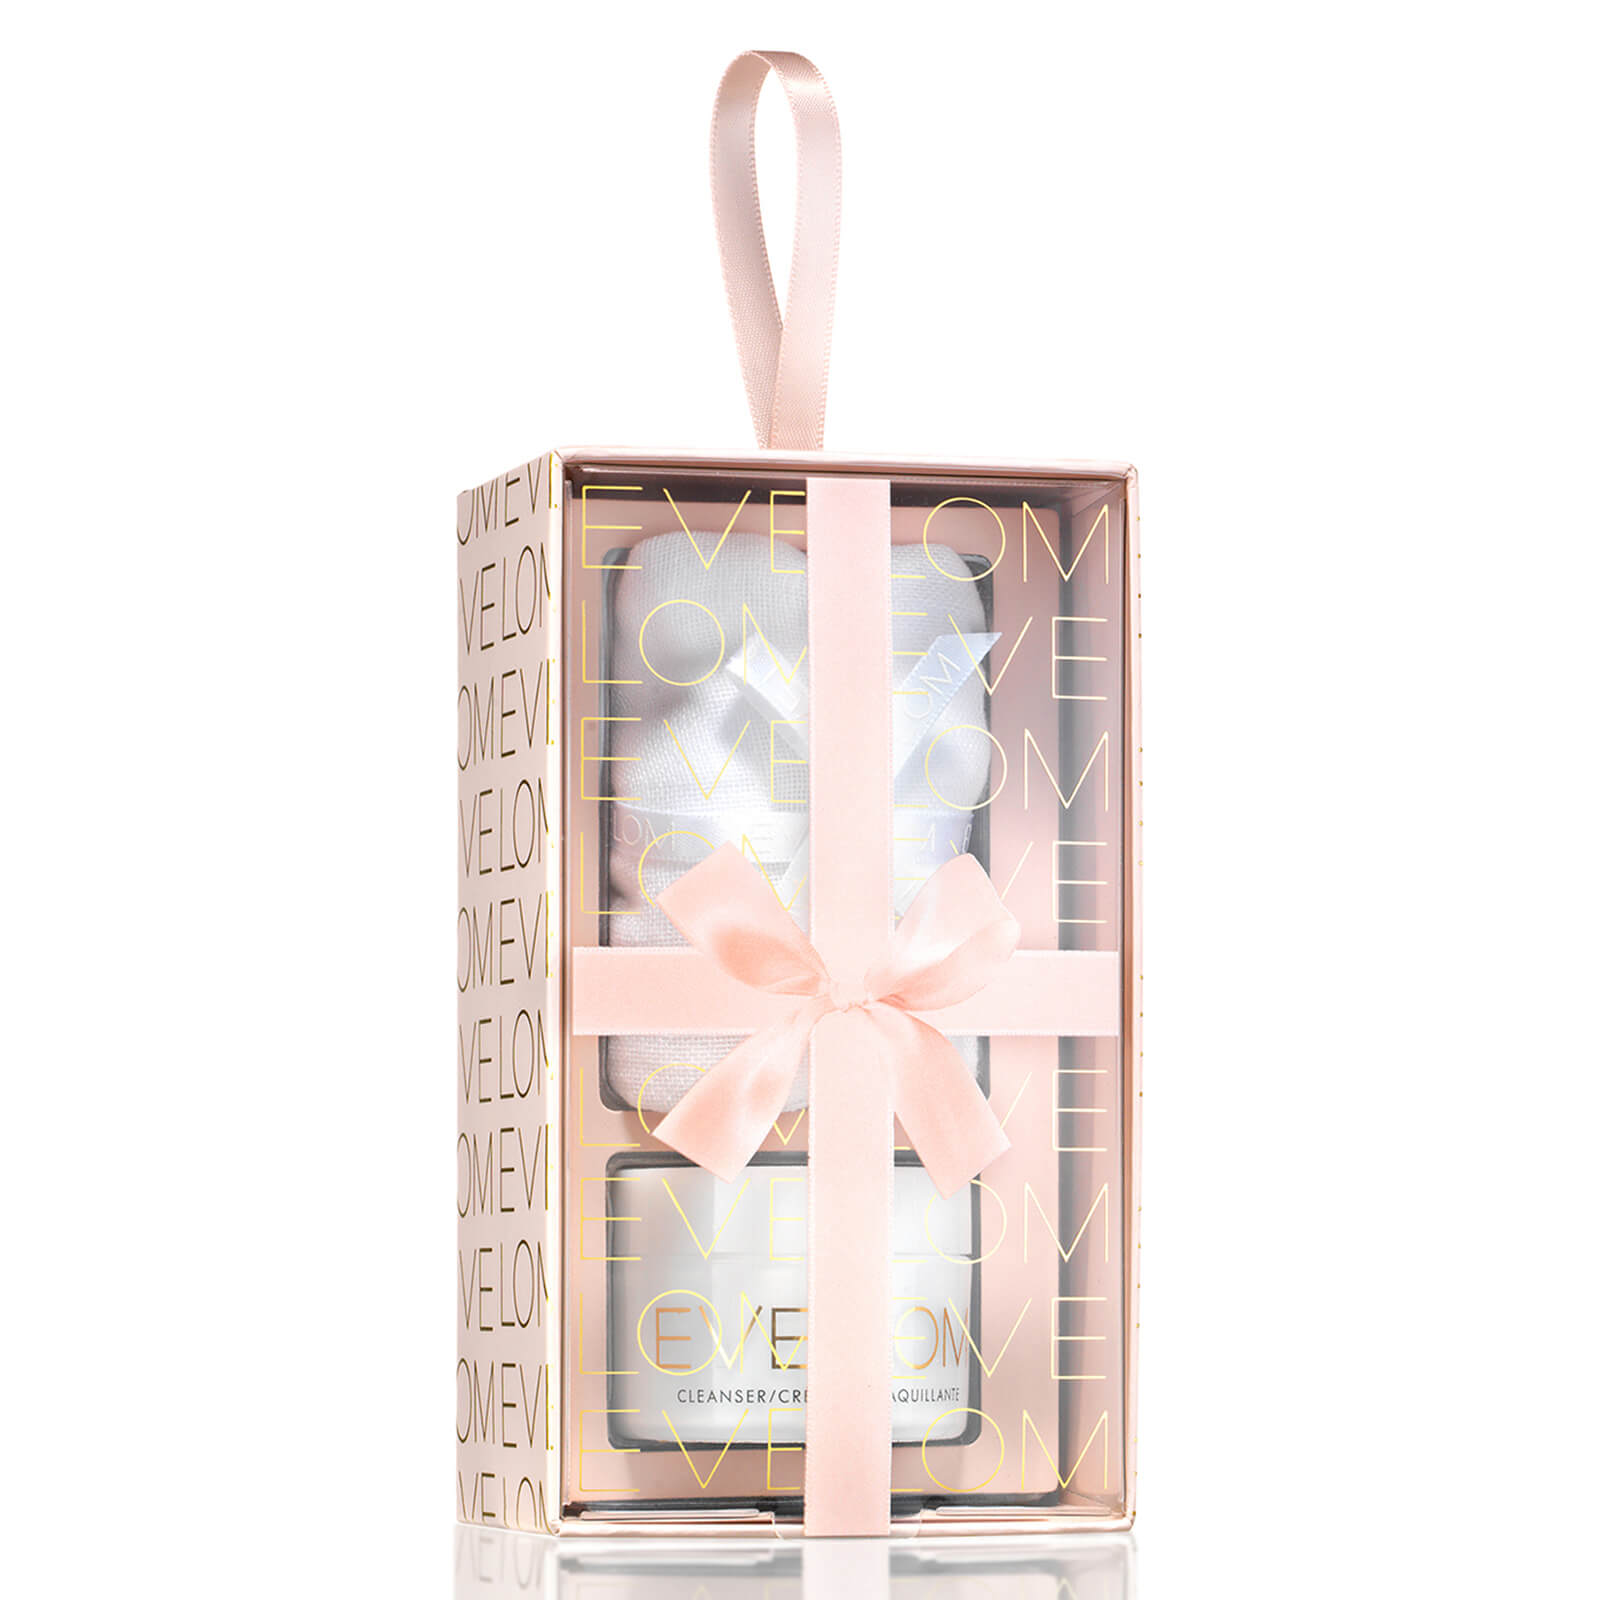 EVE LOM 經典卸妝膏旅行套裝 20ml+潔面巾